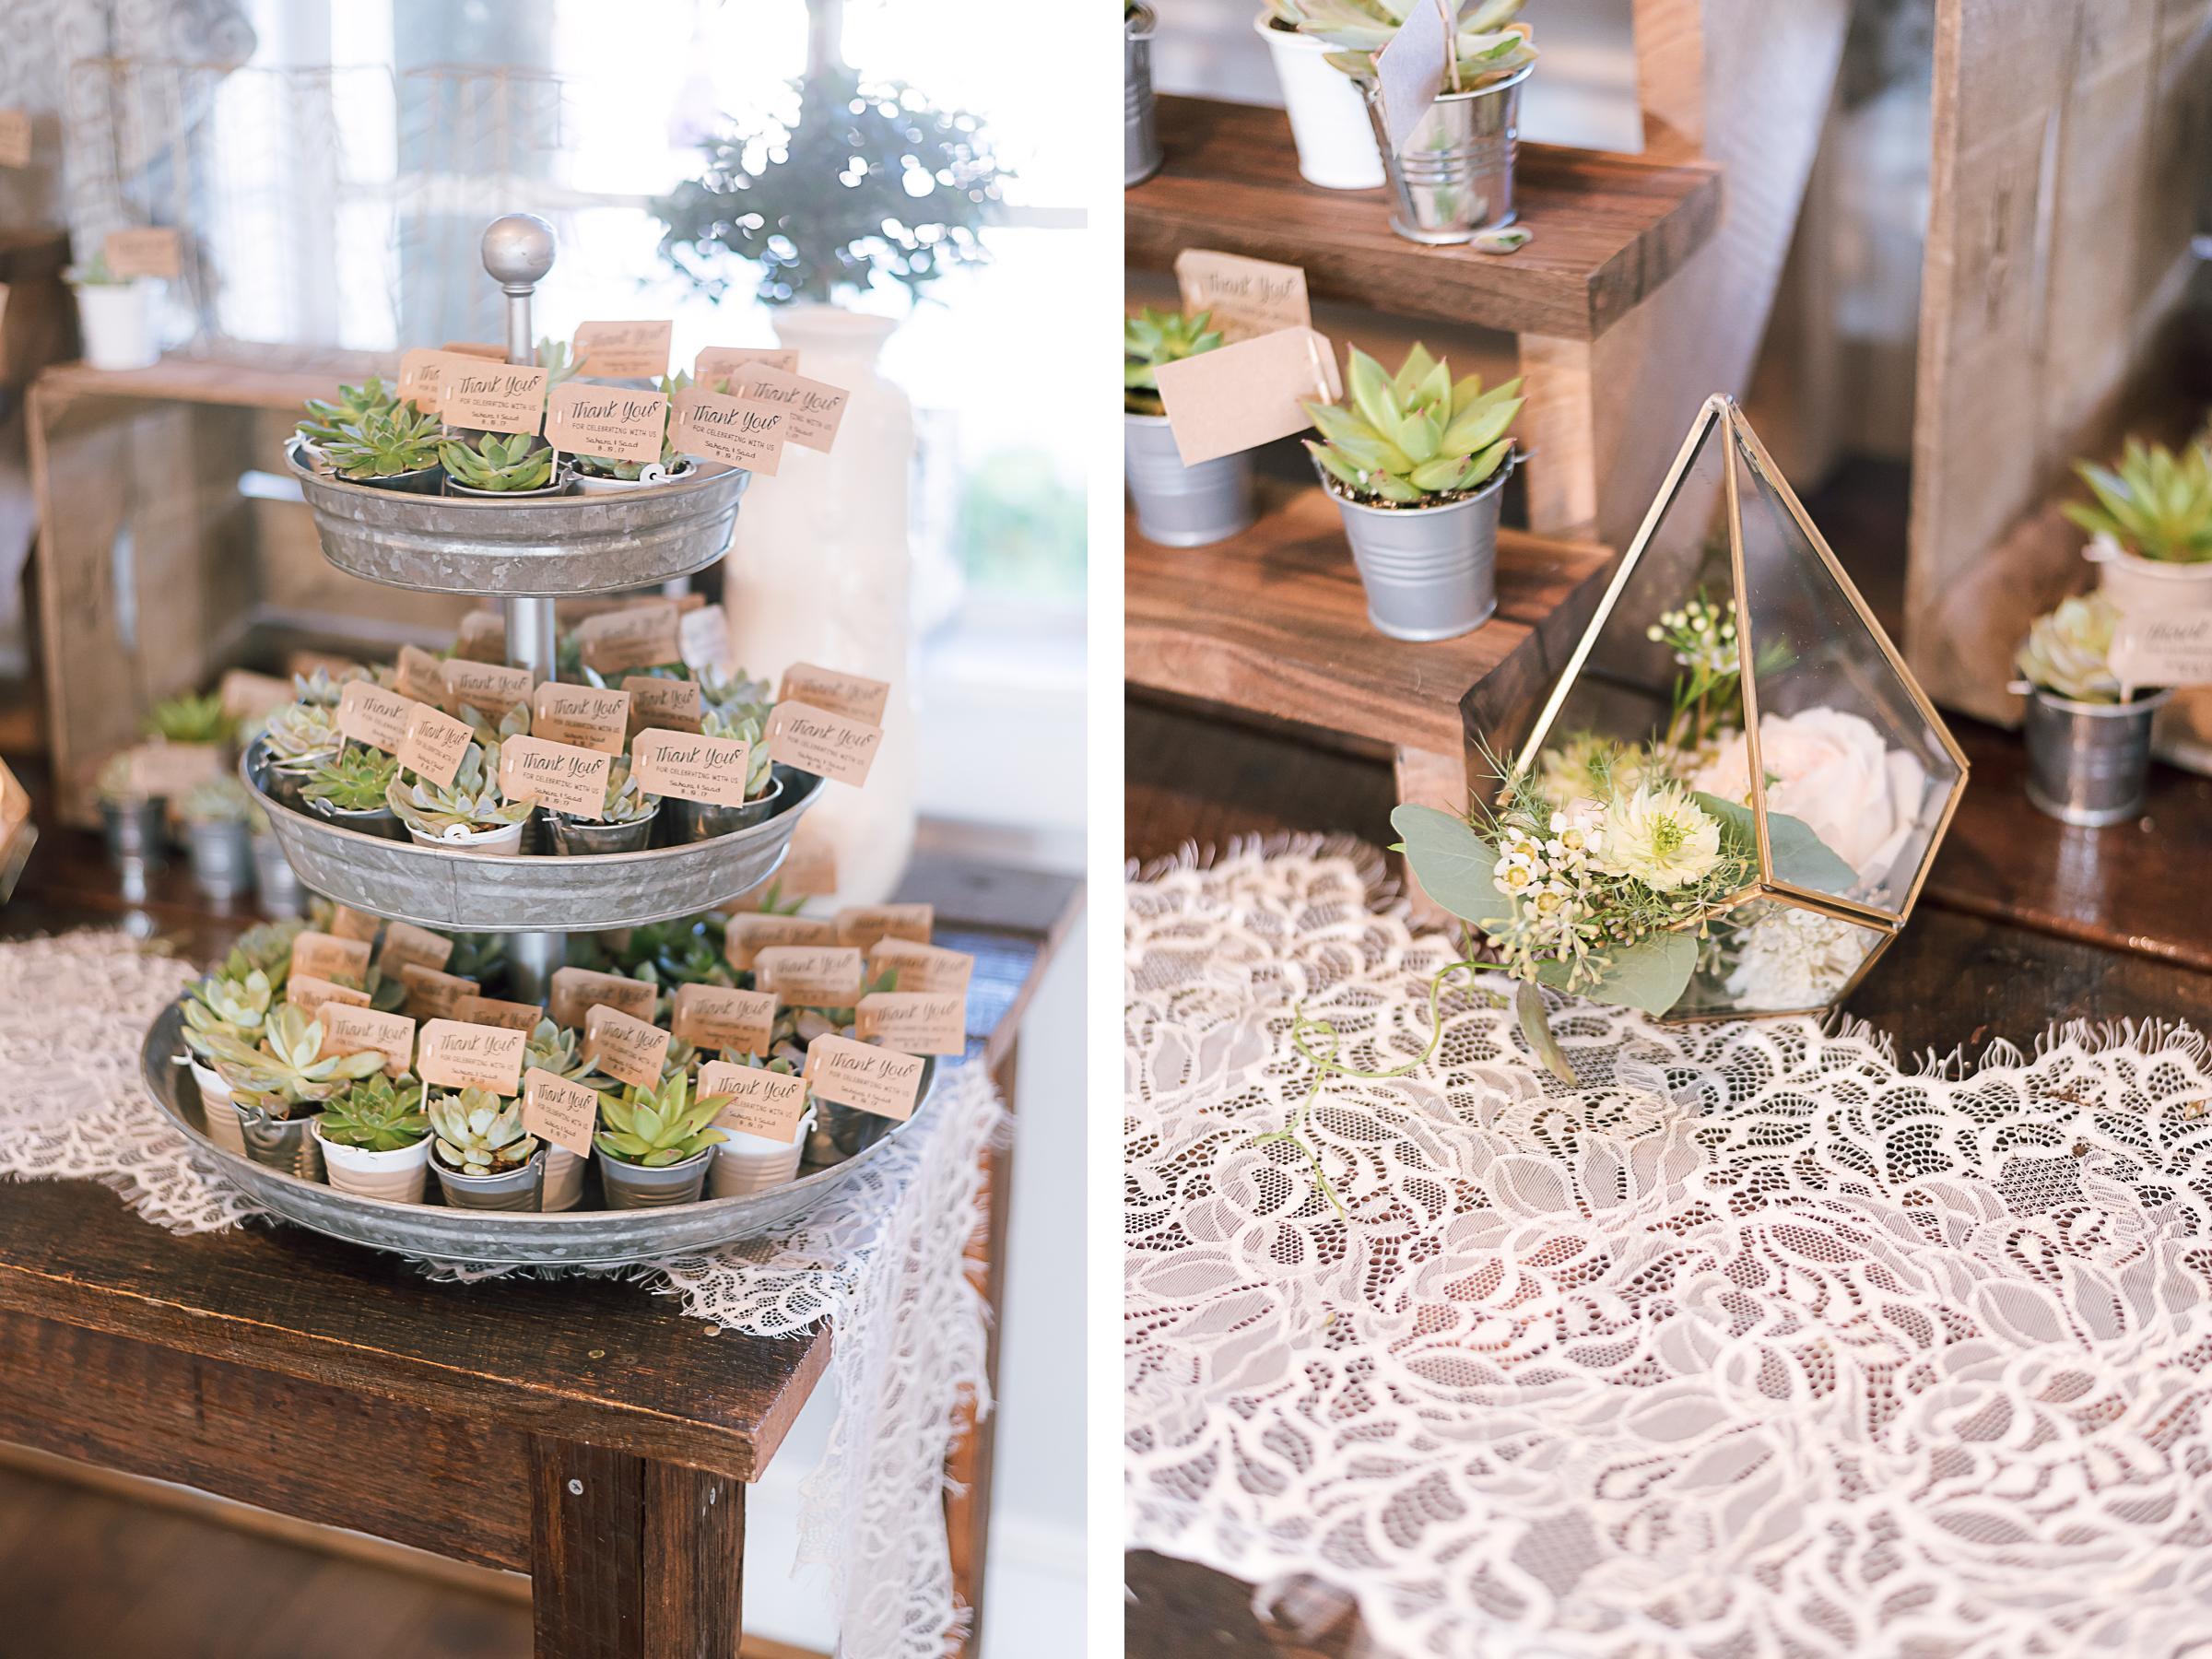 MD-Herrington-on-the-Bay-Wedding-Reception-Details-Succulents.jpg